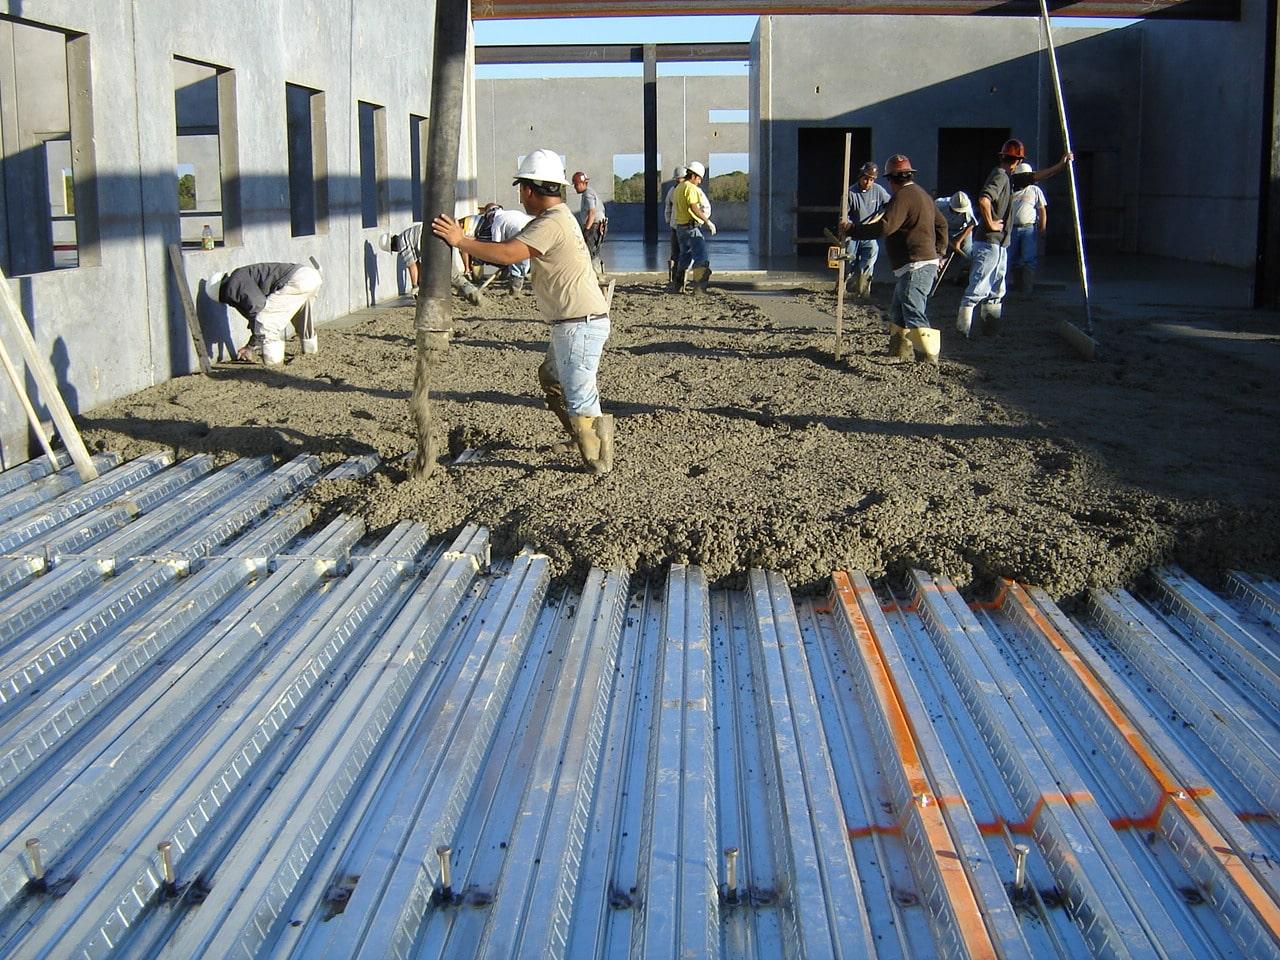 چگونه سقف عرشه فولادی اجرا می گردد؟